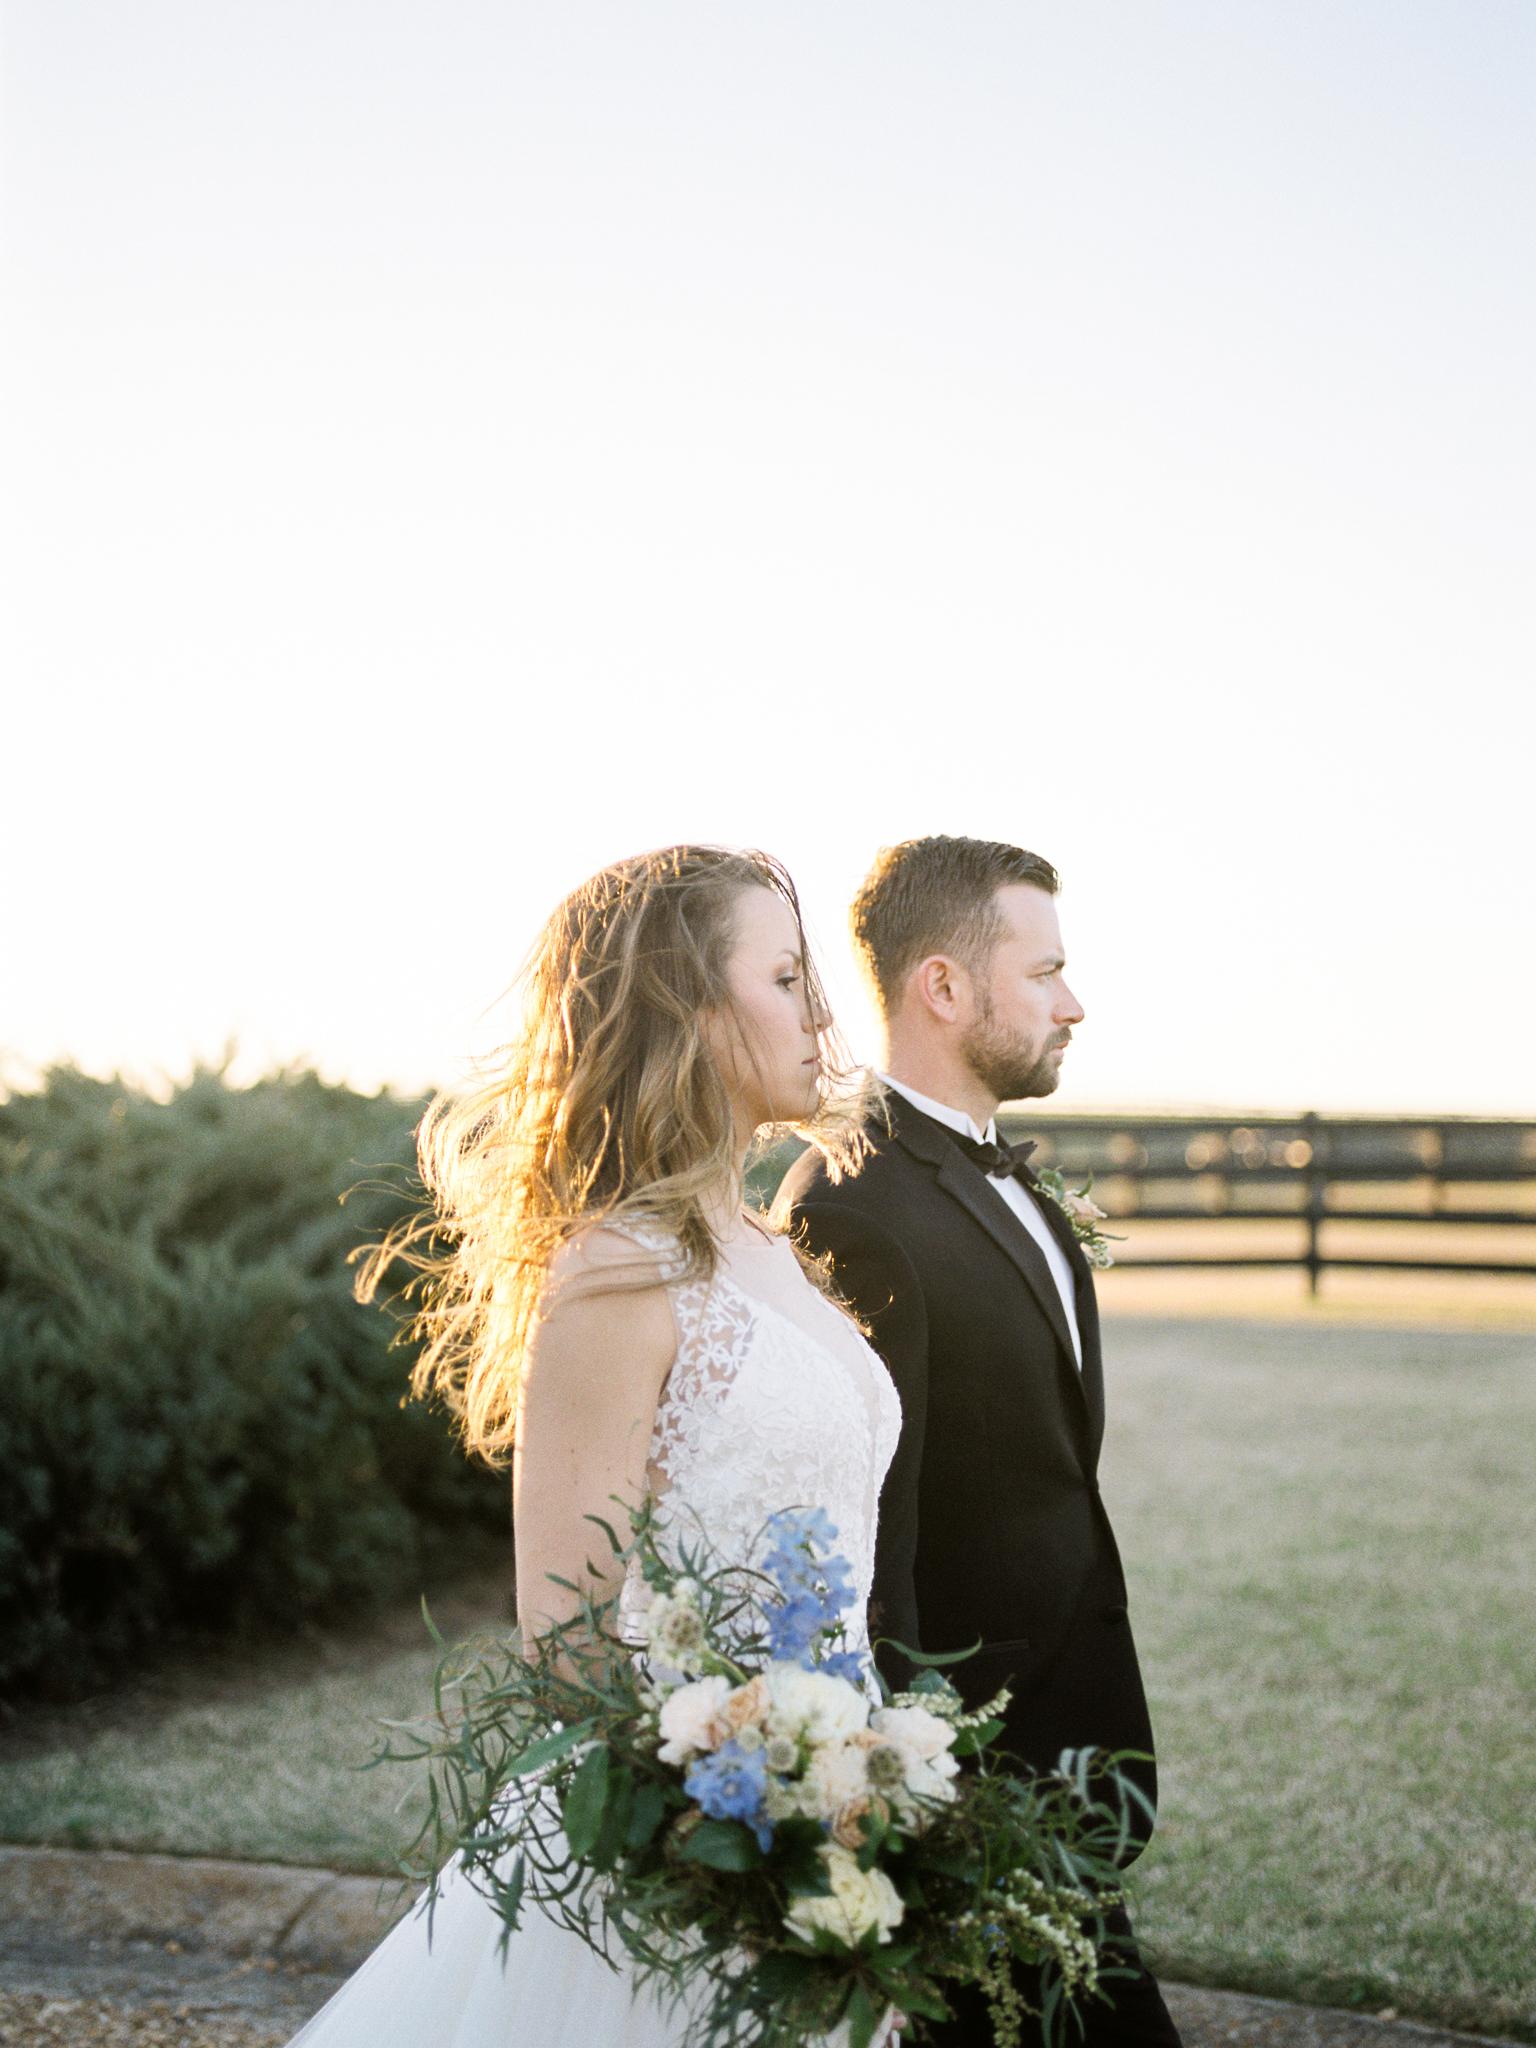 christinadavis+weddinginspiration12.jpg